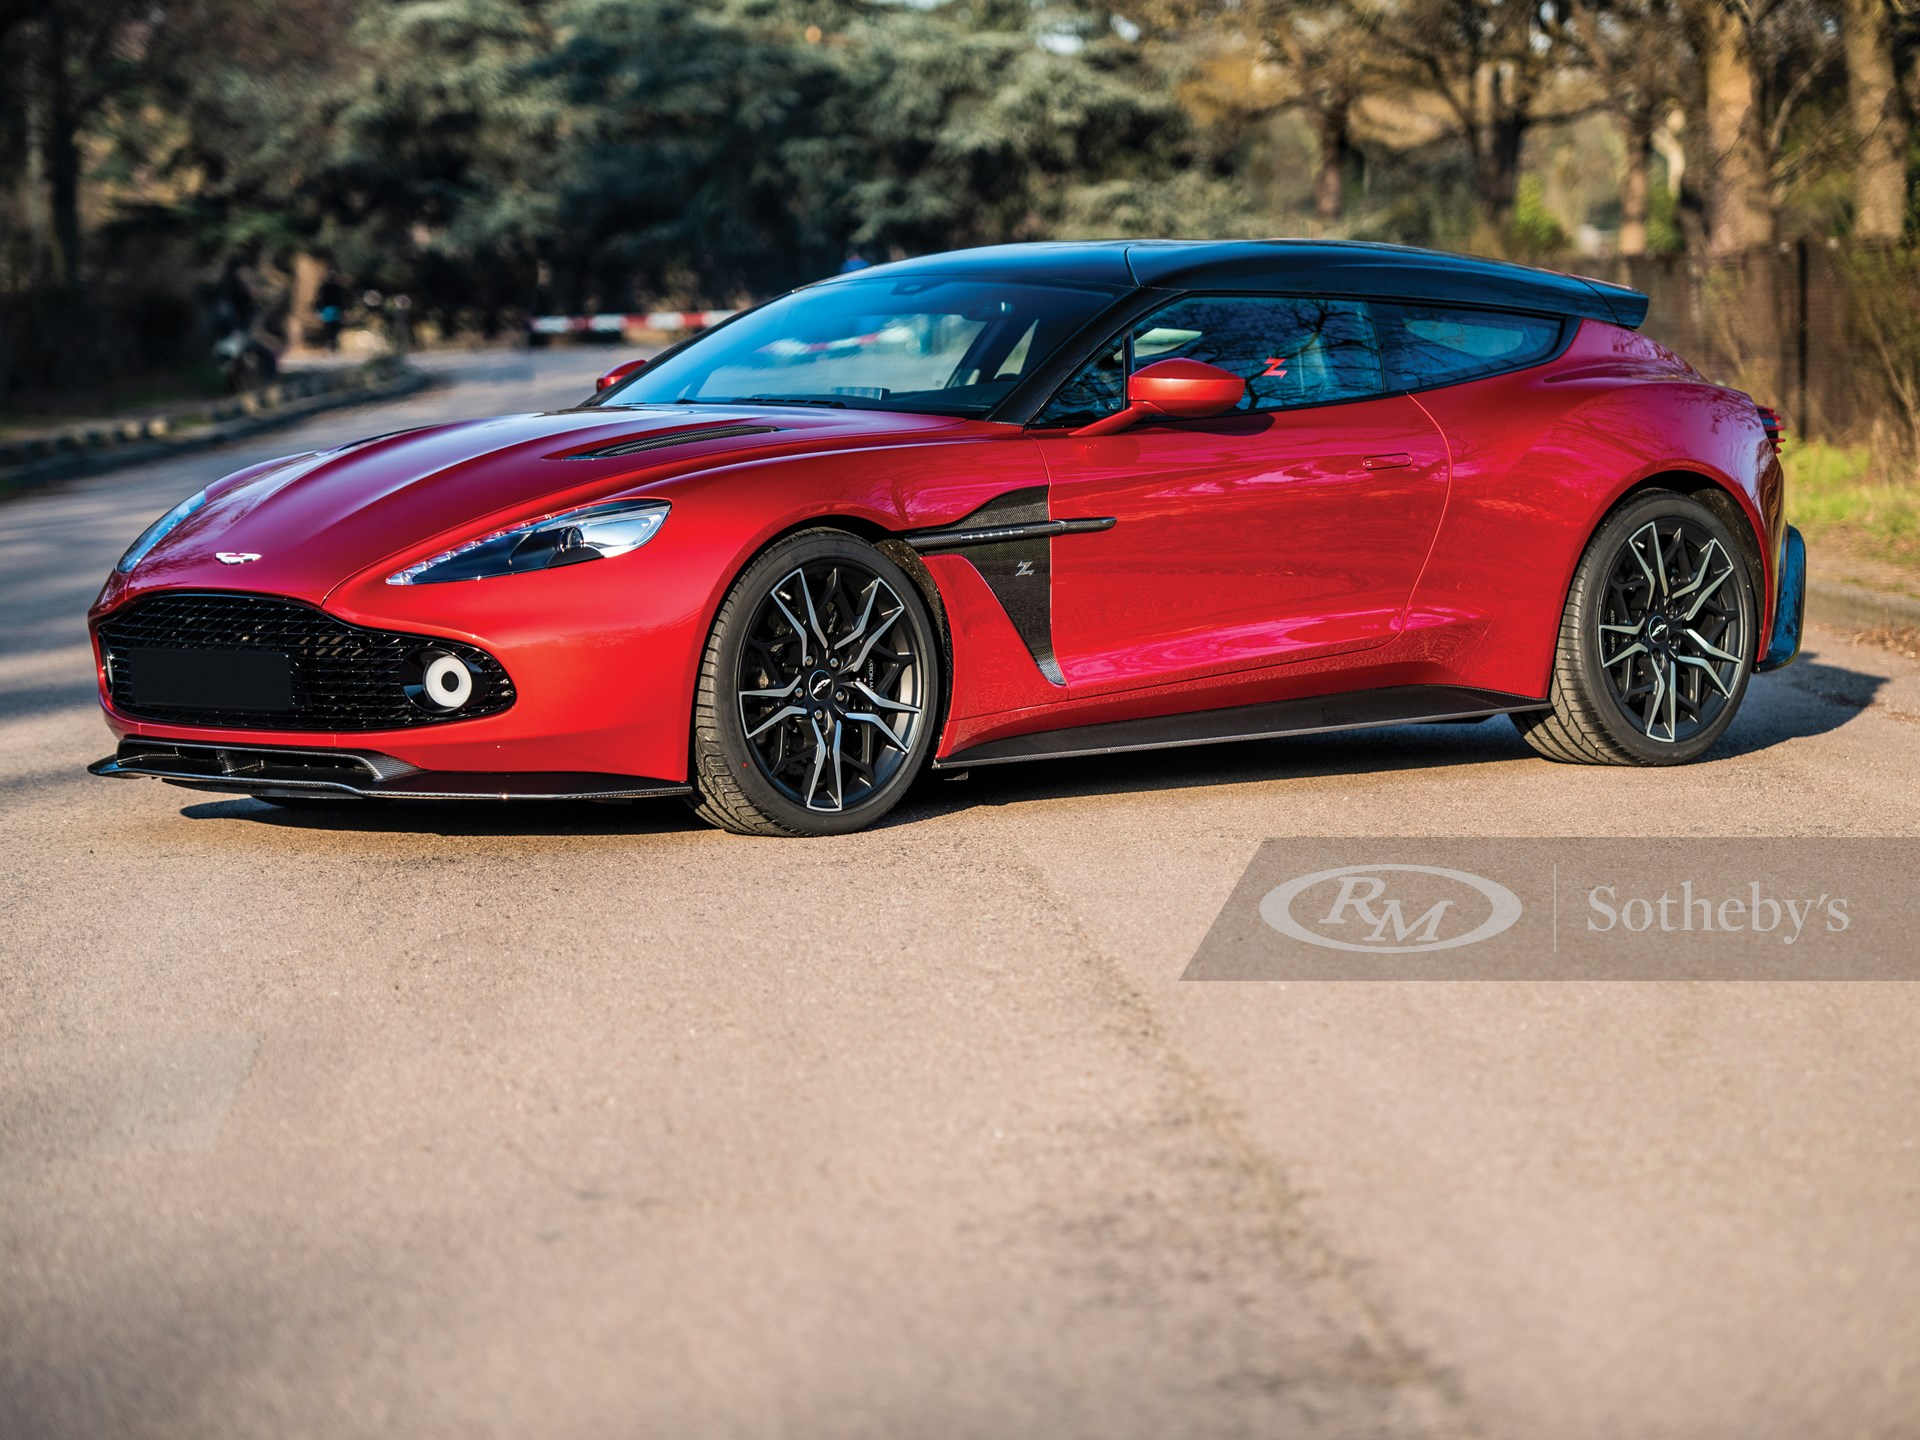 2019 Aston Martin Vanquish Zagato Shooting Brake Villa Erba 2019 Rm Sotheby S